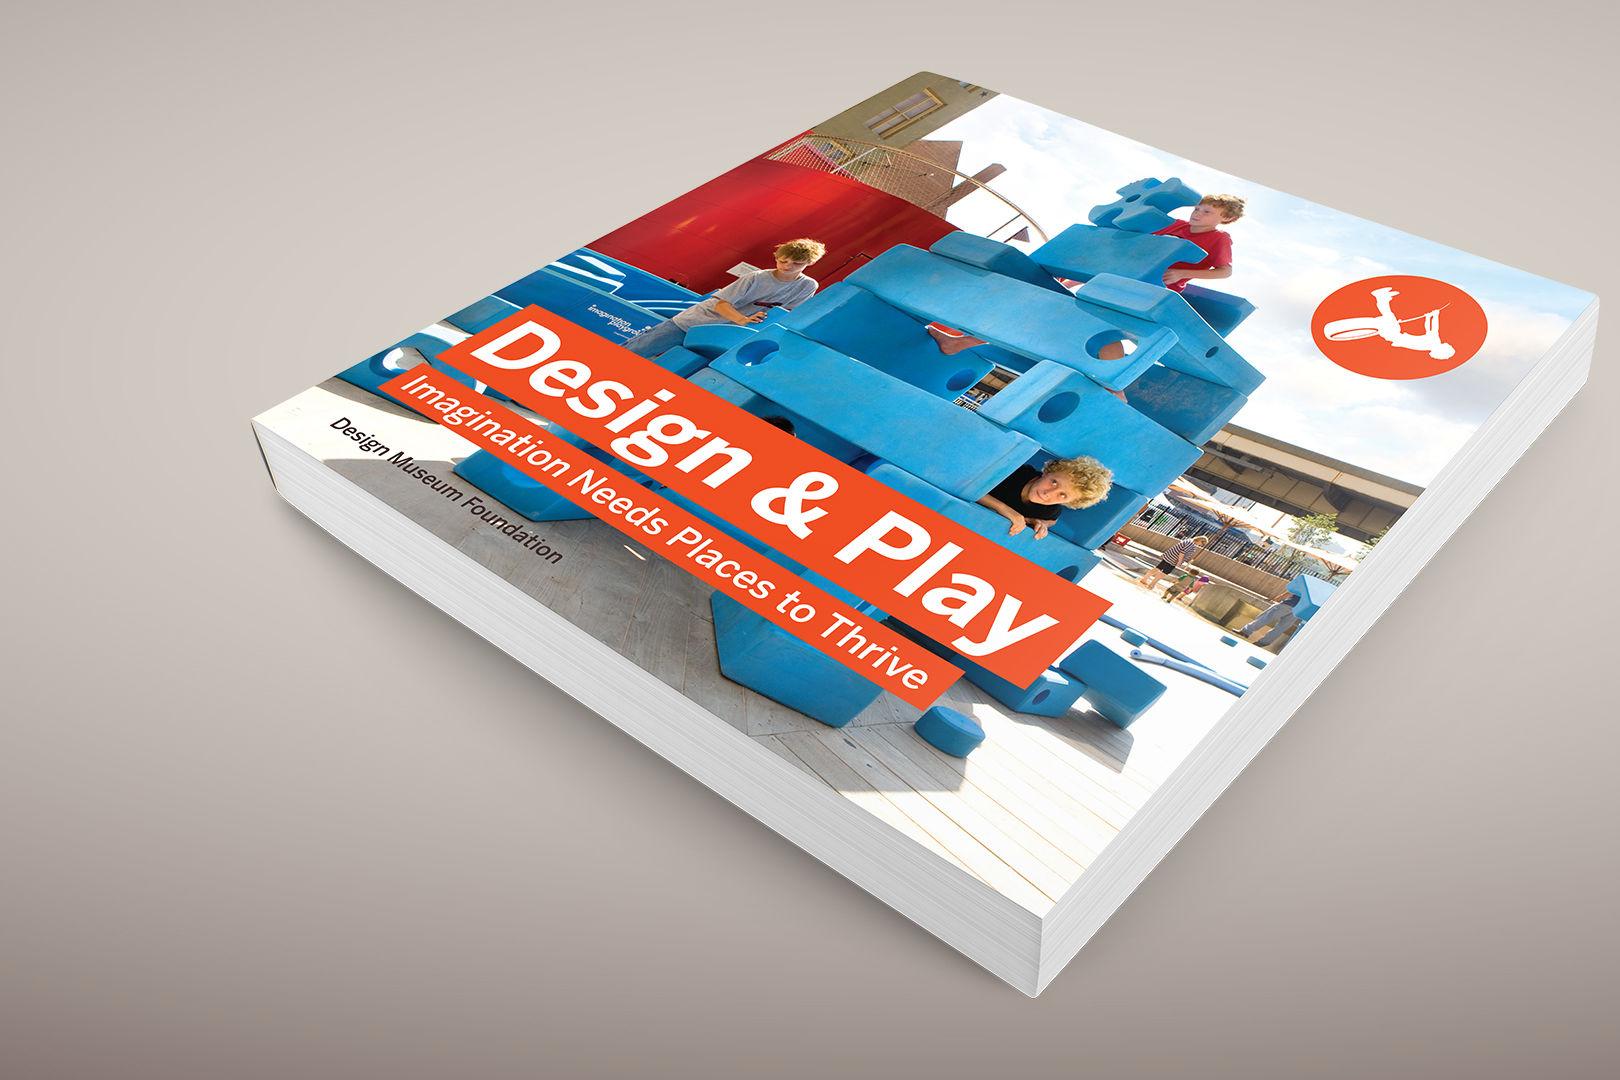 Designmuseum design play media 1 slz4nh